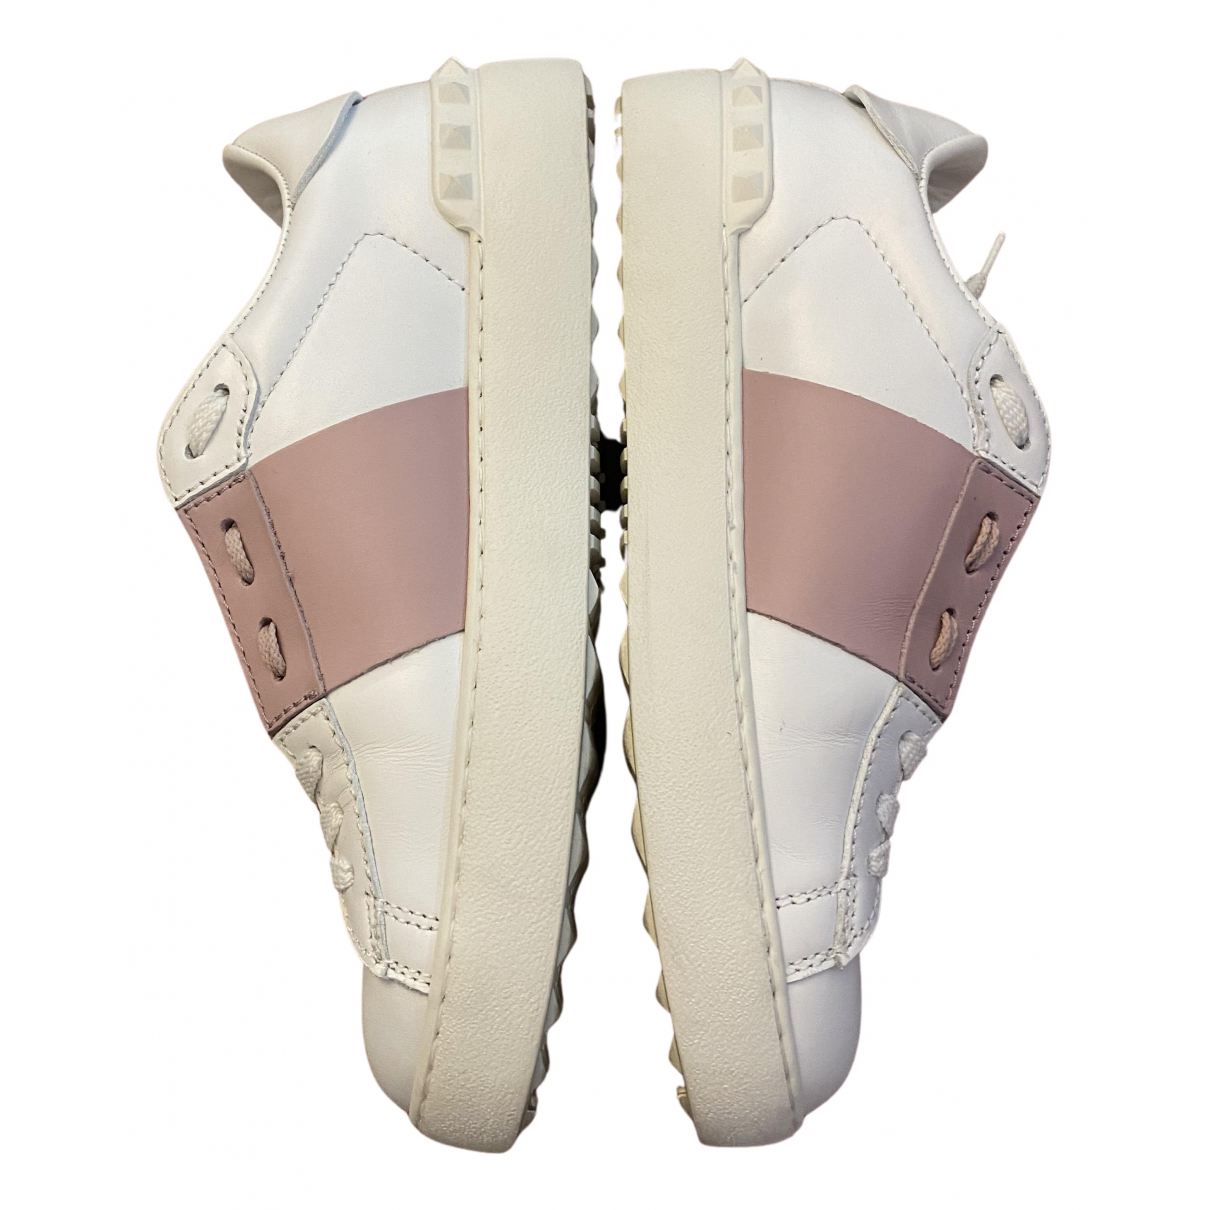 Valentino Garavani Rockstud White Leather Trainers for Women 37 EU